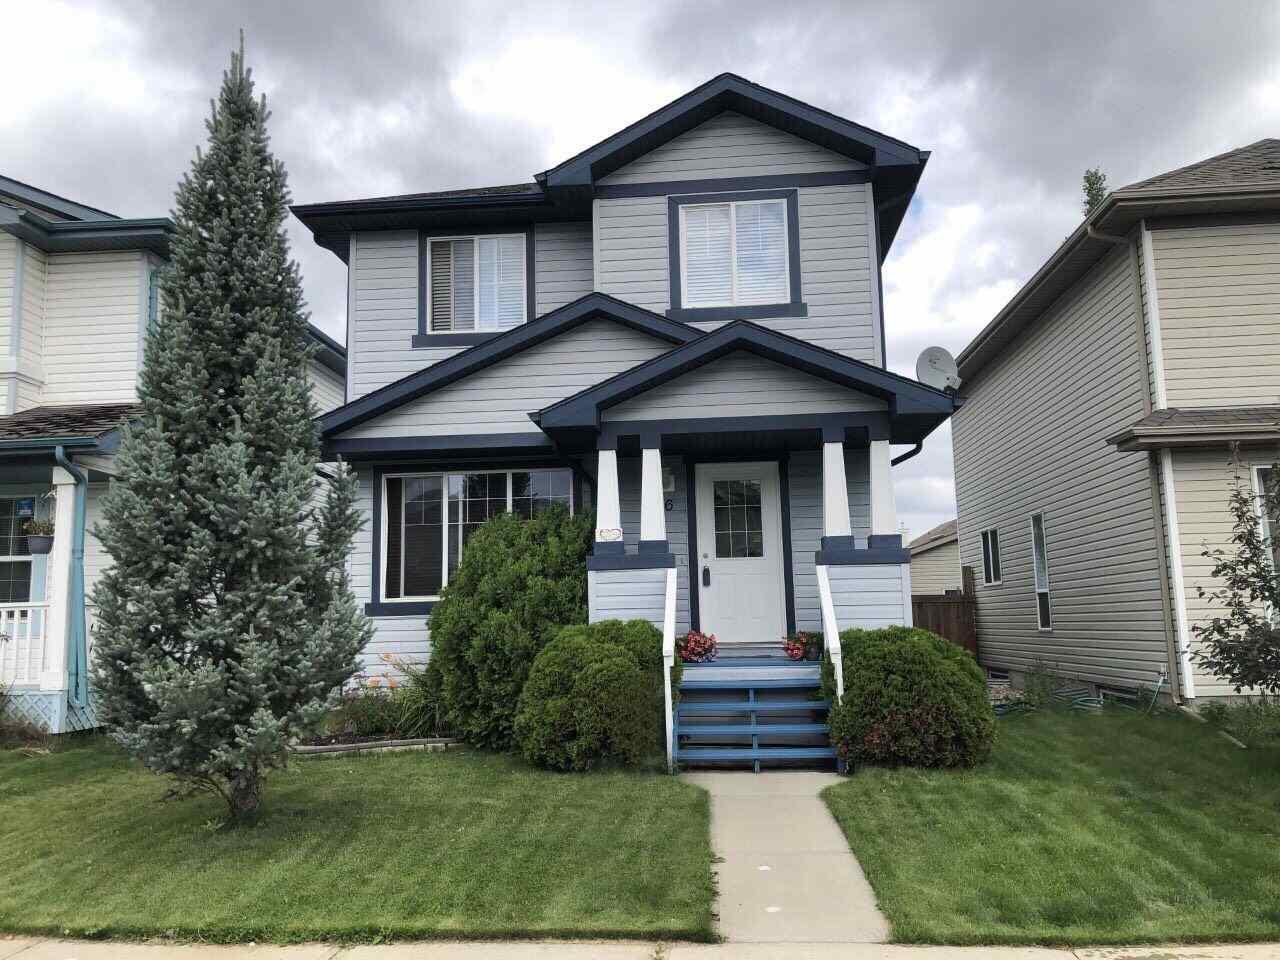 Main Photo: 826 McAllister Crescent in Edmonton: Zone 55 House for sale : MLS®# E4168084